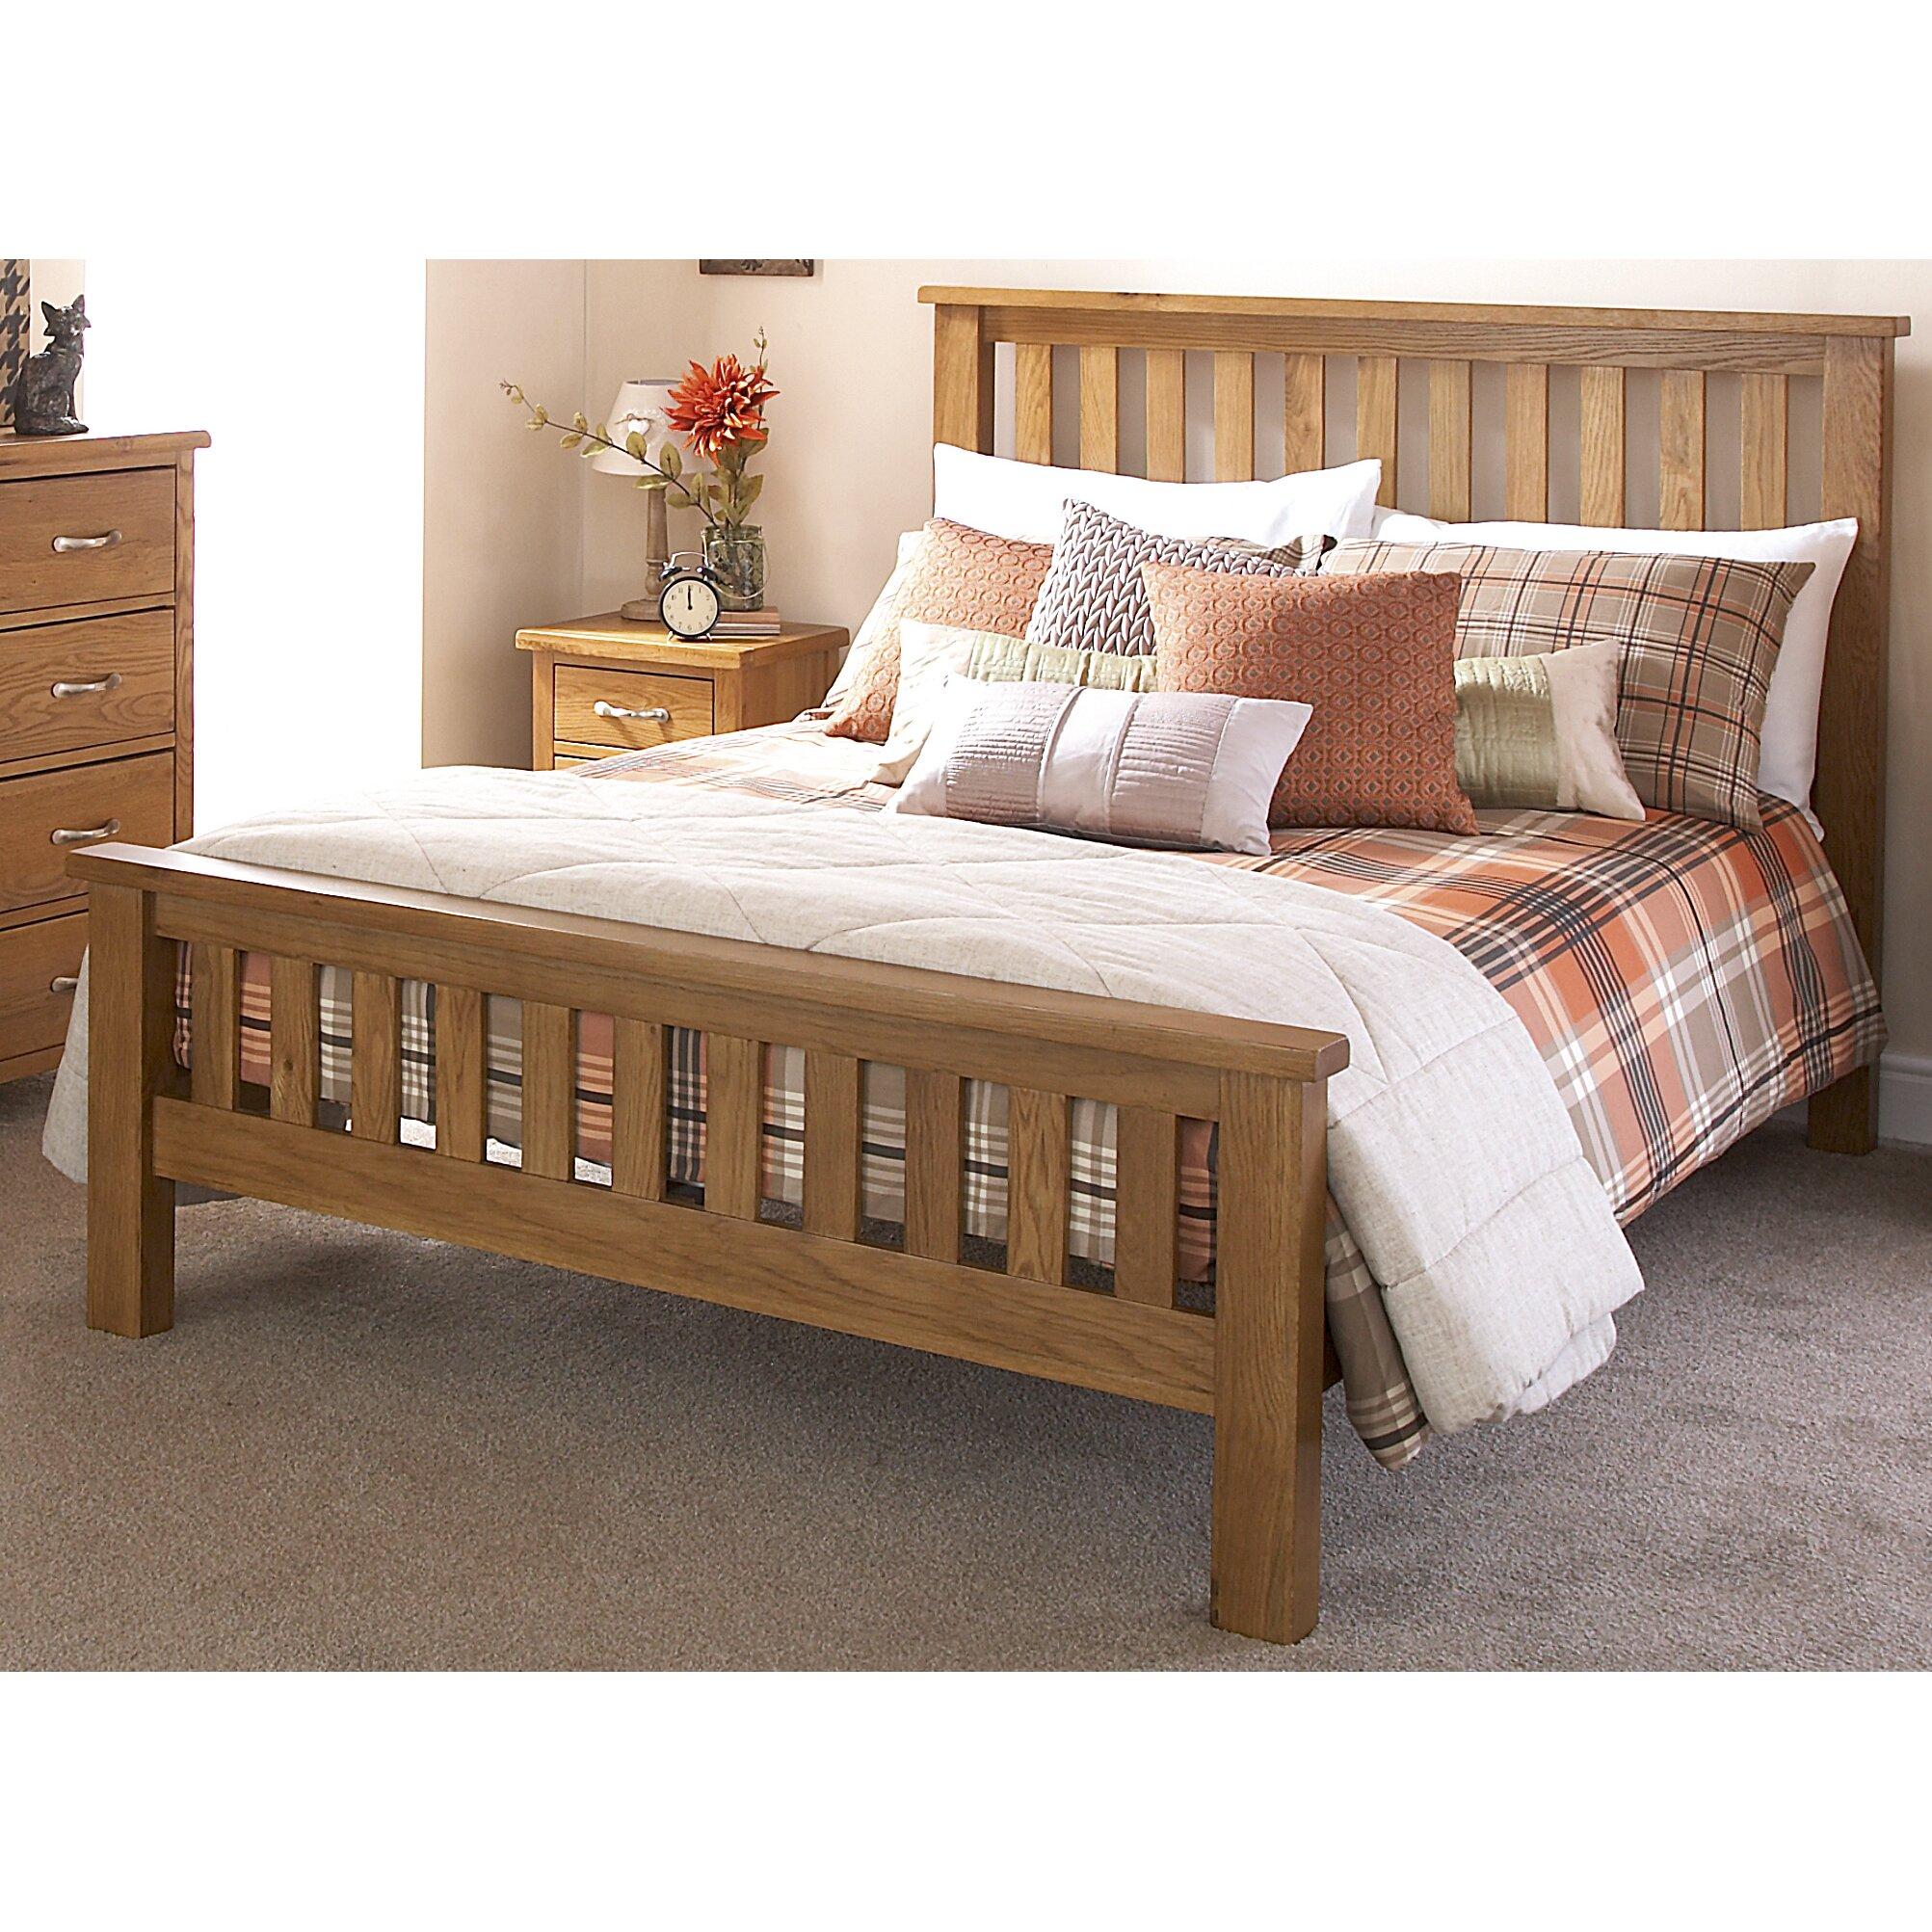 Home loft concept bowden bed frame reviews wayfair uk for Concept beds